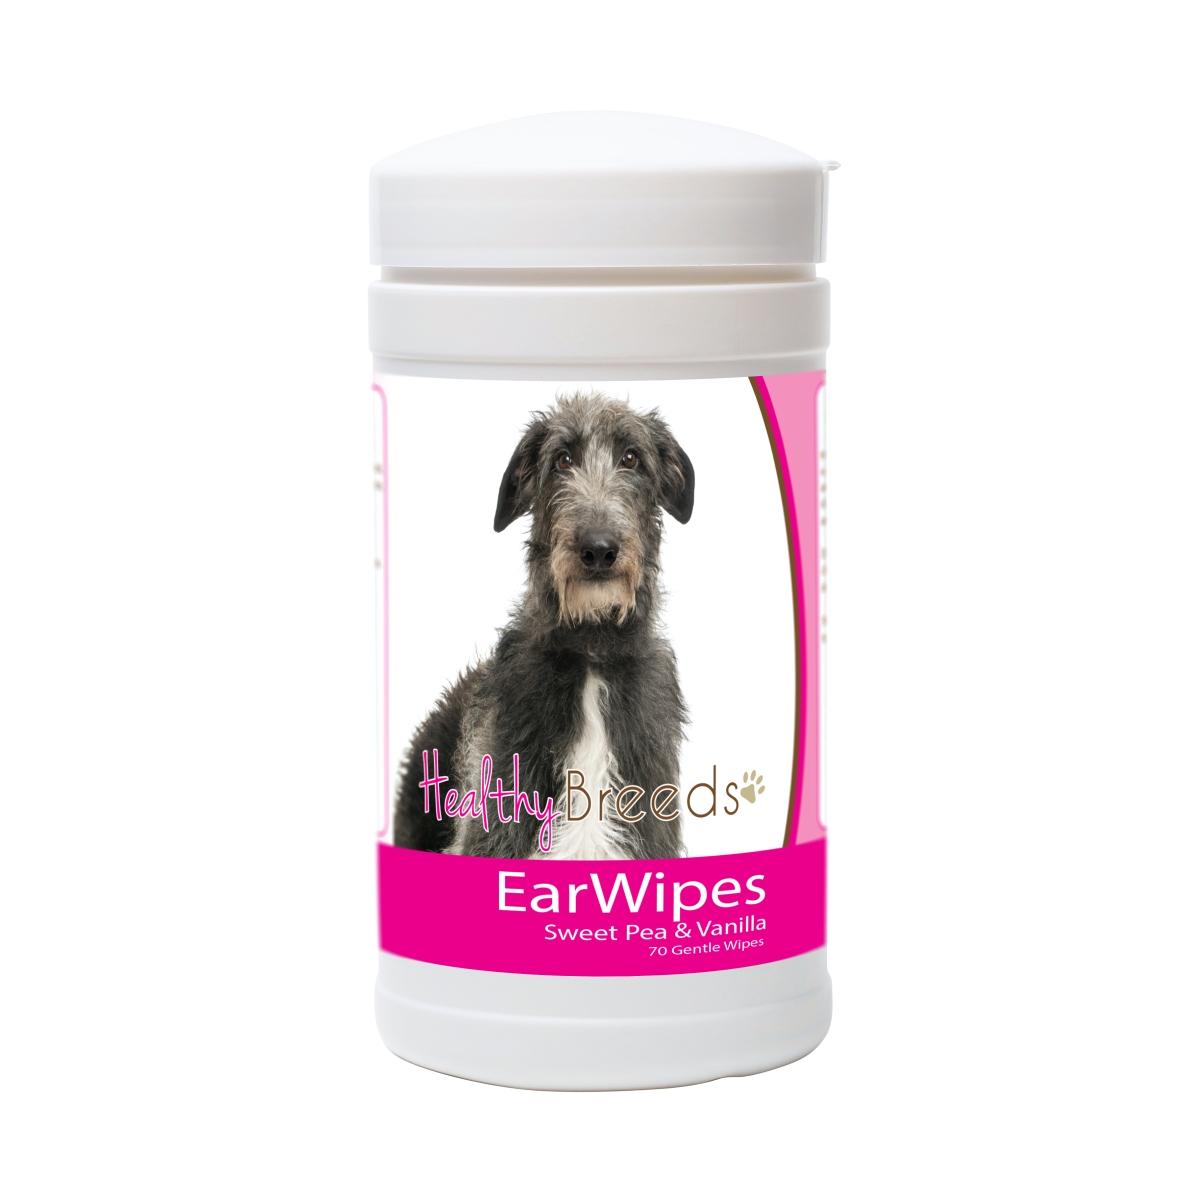 Healthy Breeds 840235181934 Scottish Deerhound Ear Wipes - 70 Count